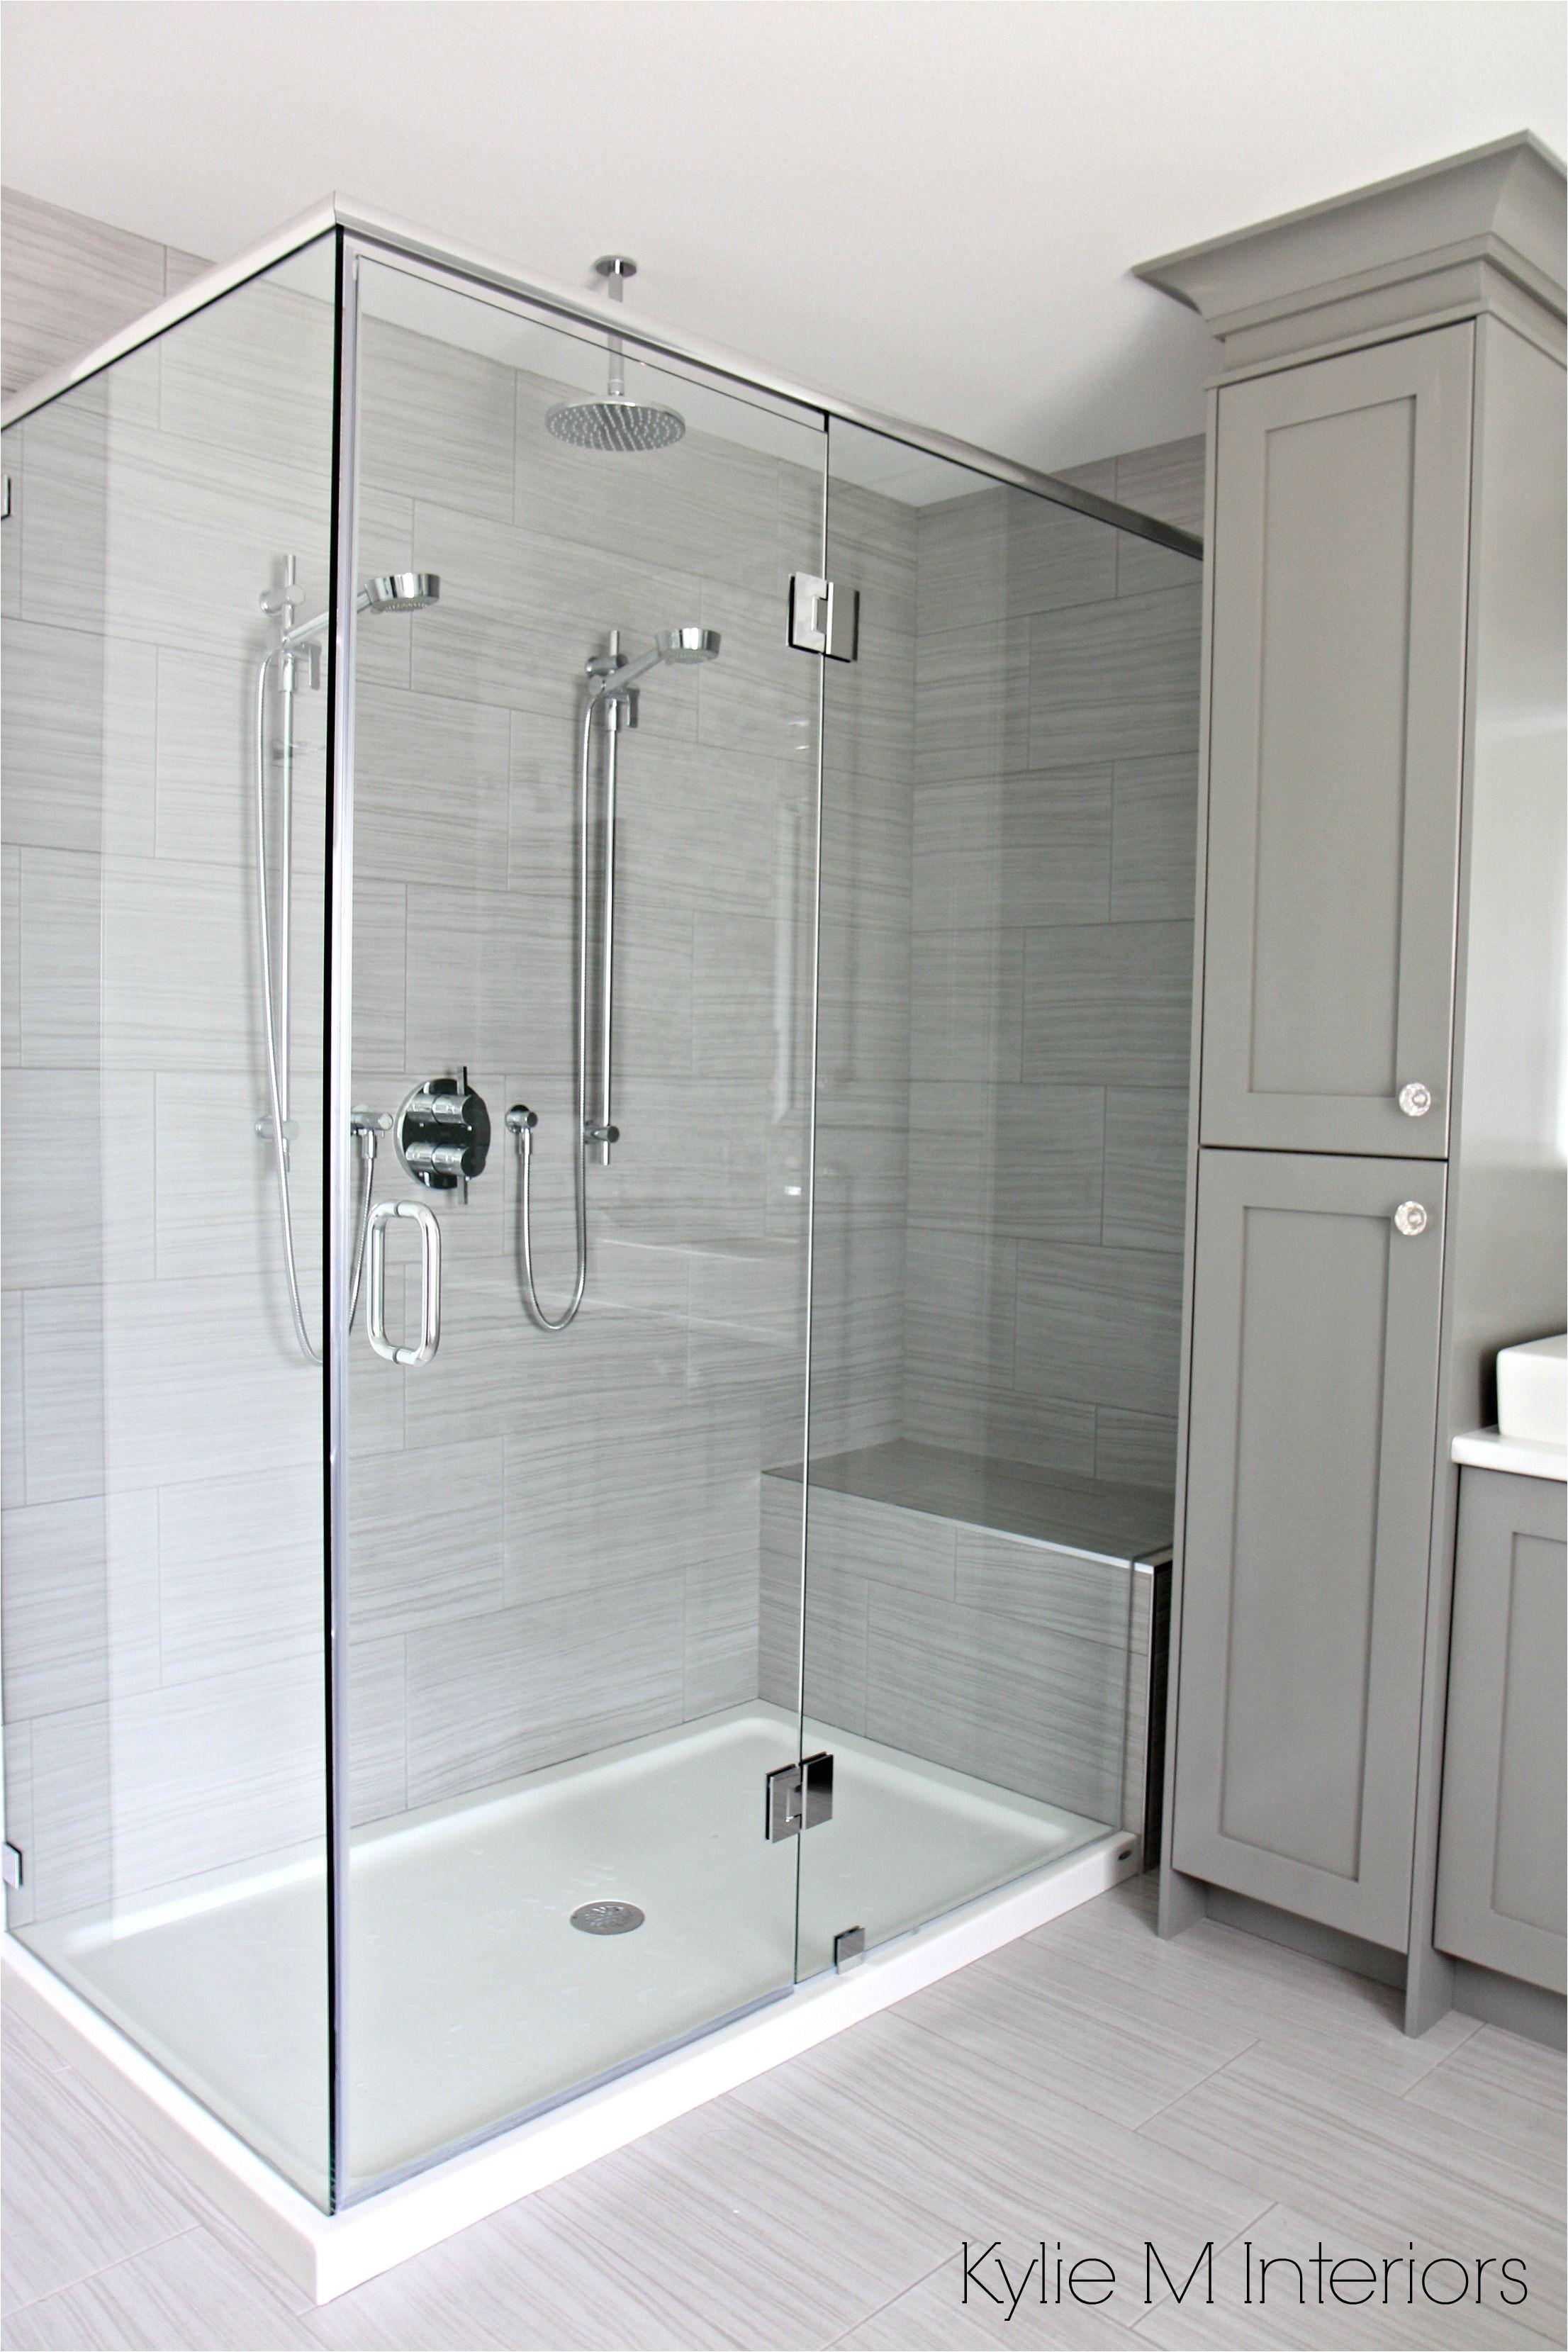 Shower Doors Of Austin Walk In Shower with 2 Shower Heads Fibreglass ...